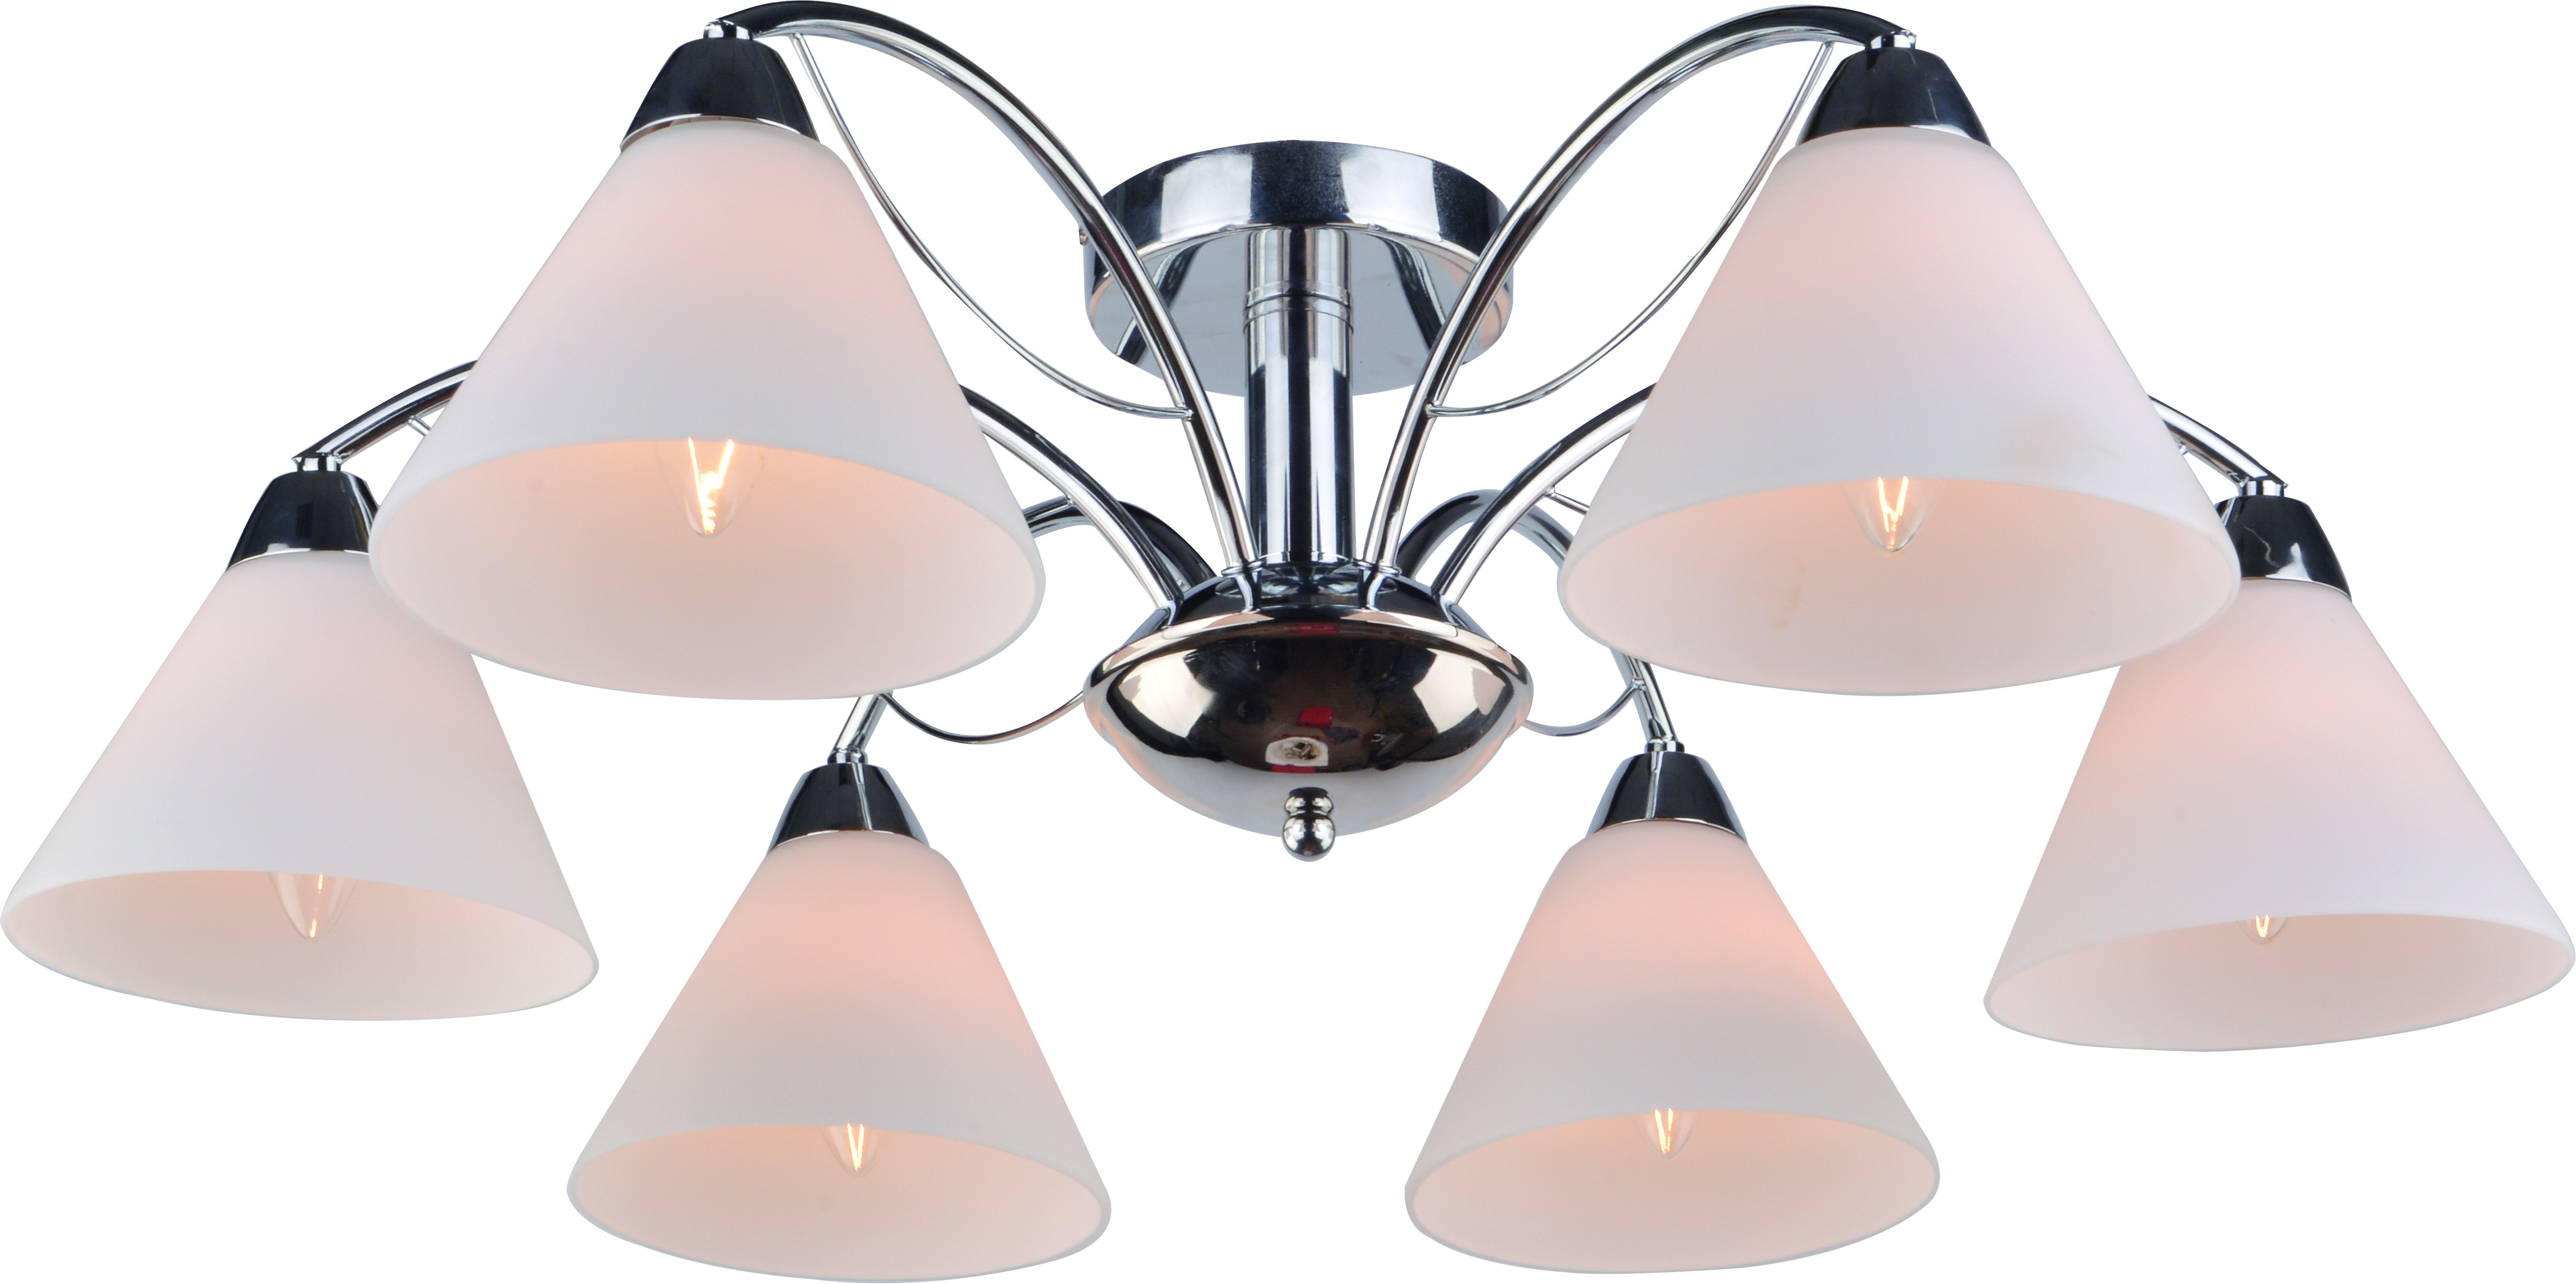 Люстра Arte lamp A1298pl-6cc люстра на штанге arte lamp federica a1298pl 3cc